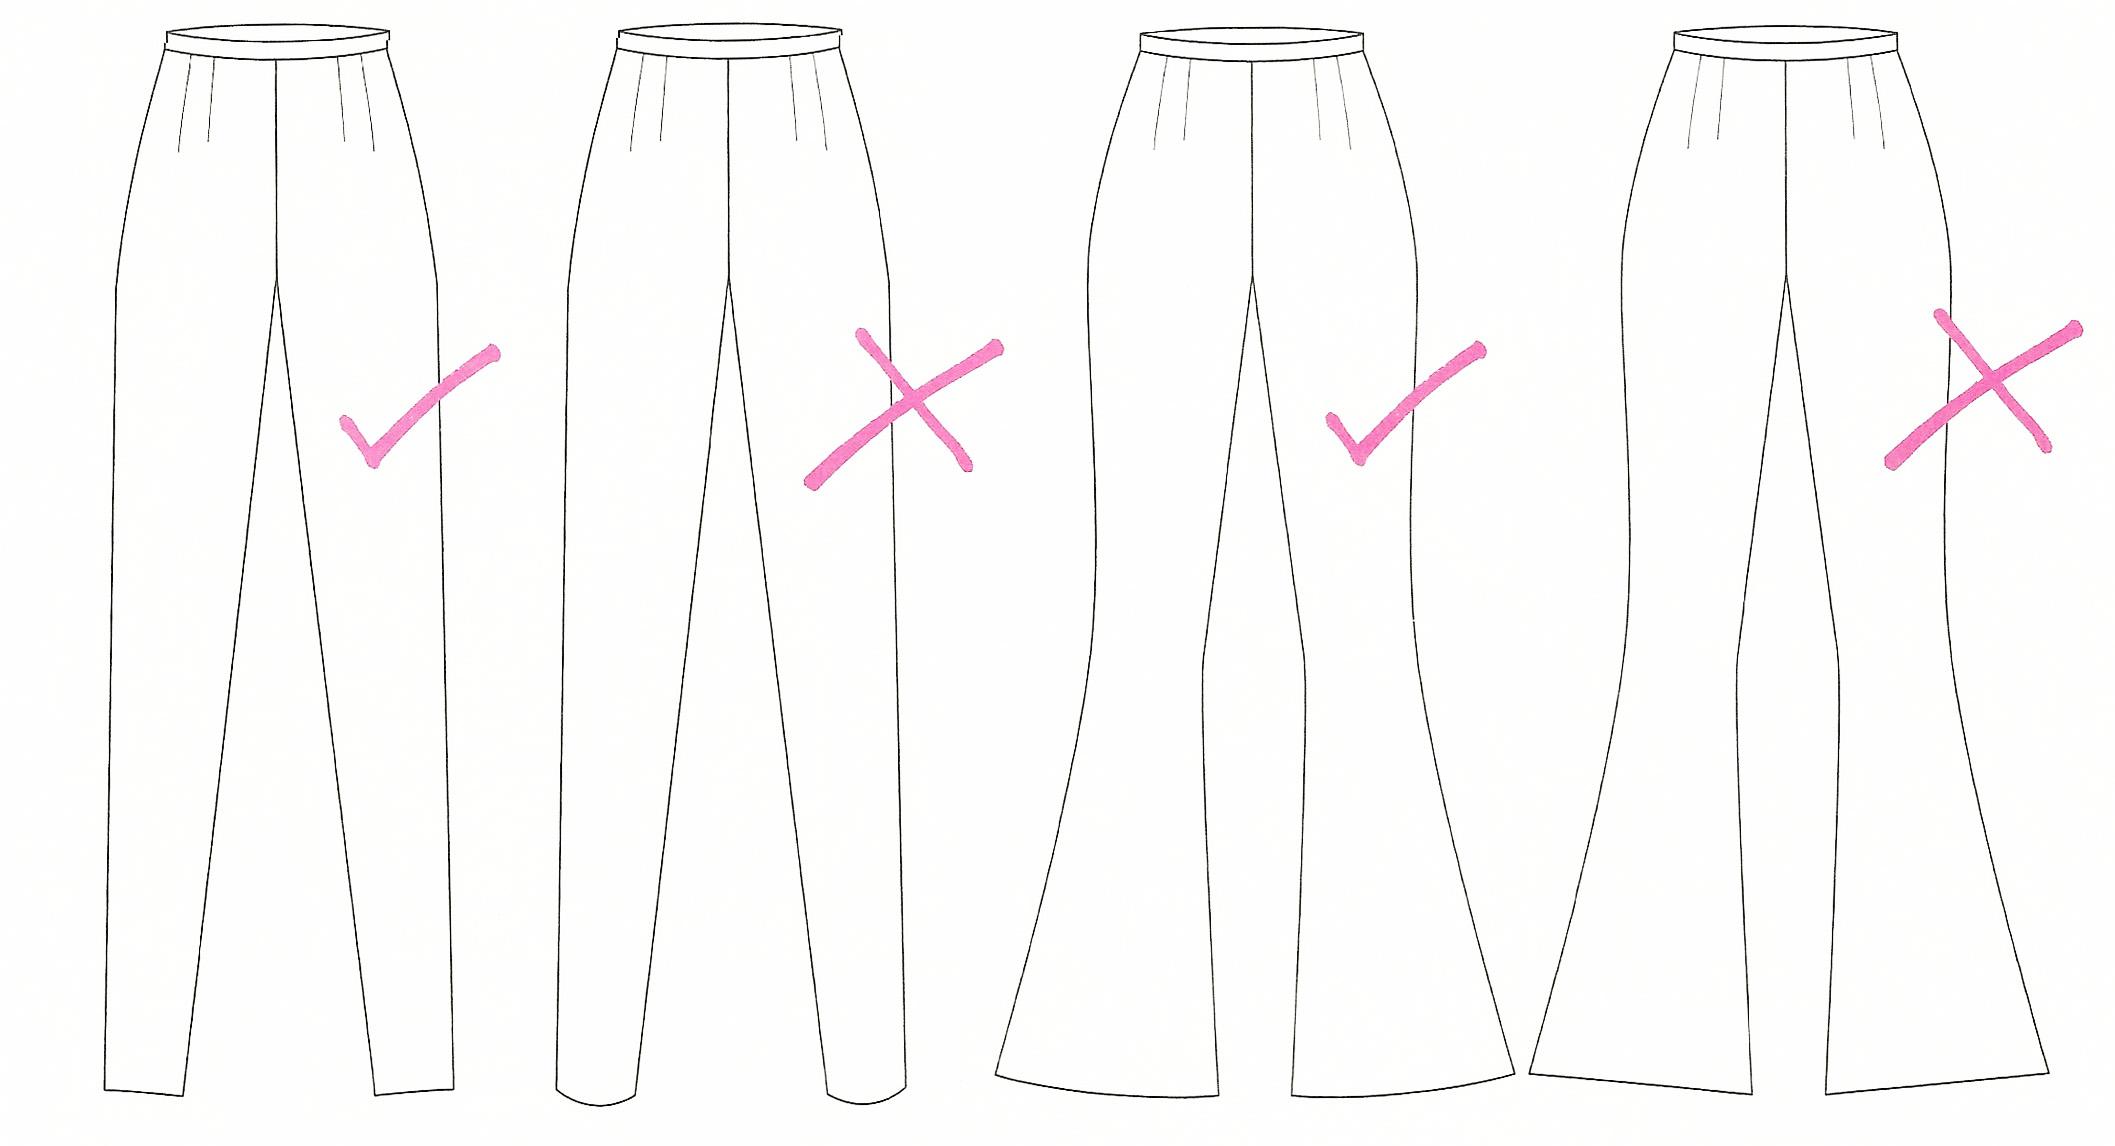 Consejos para el dibujo en plano de moda pixelnomicon for Dibujos de disenos de moda